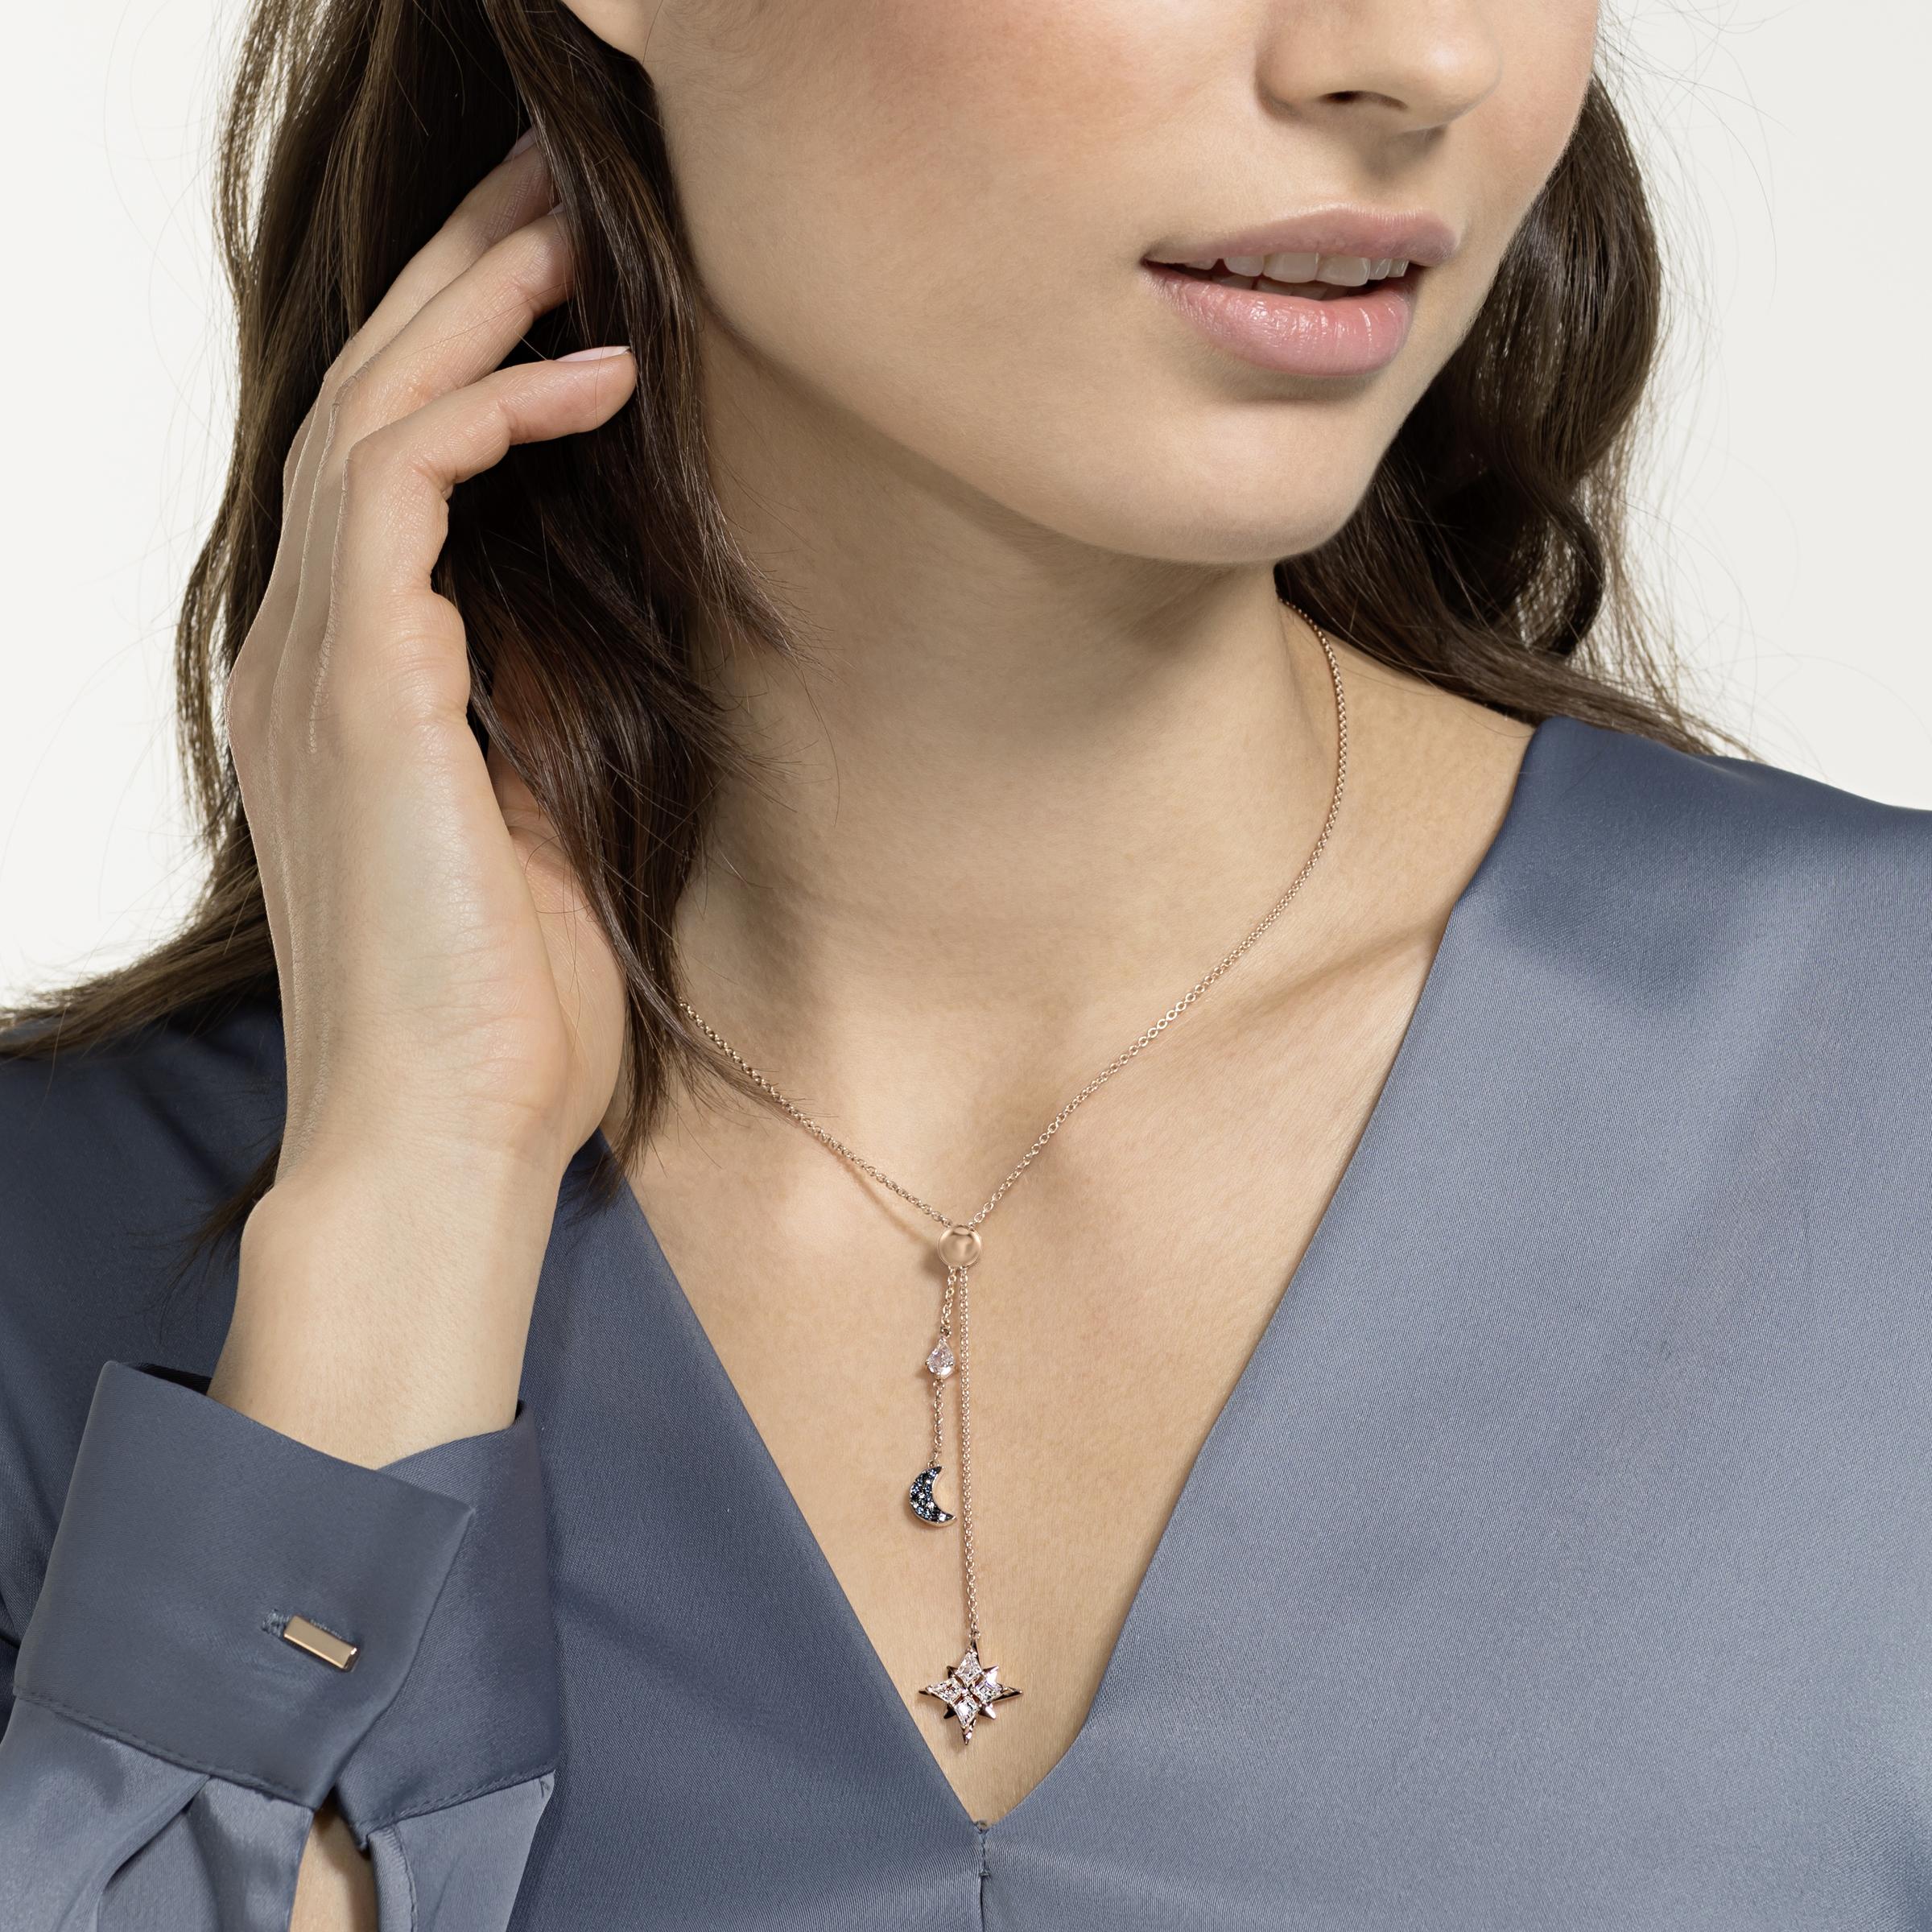 Swarovski Symbolic Y Necklace, Multi-colored, Rose-gold tone plated